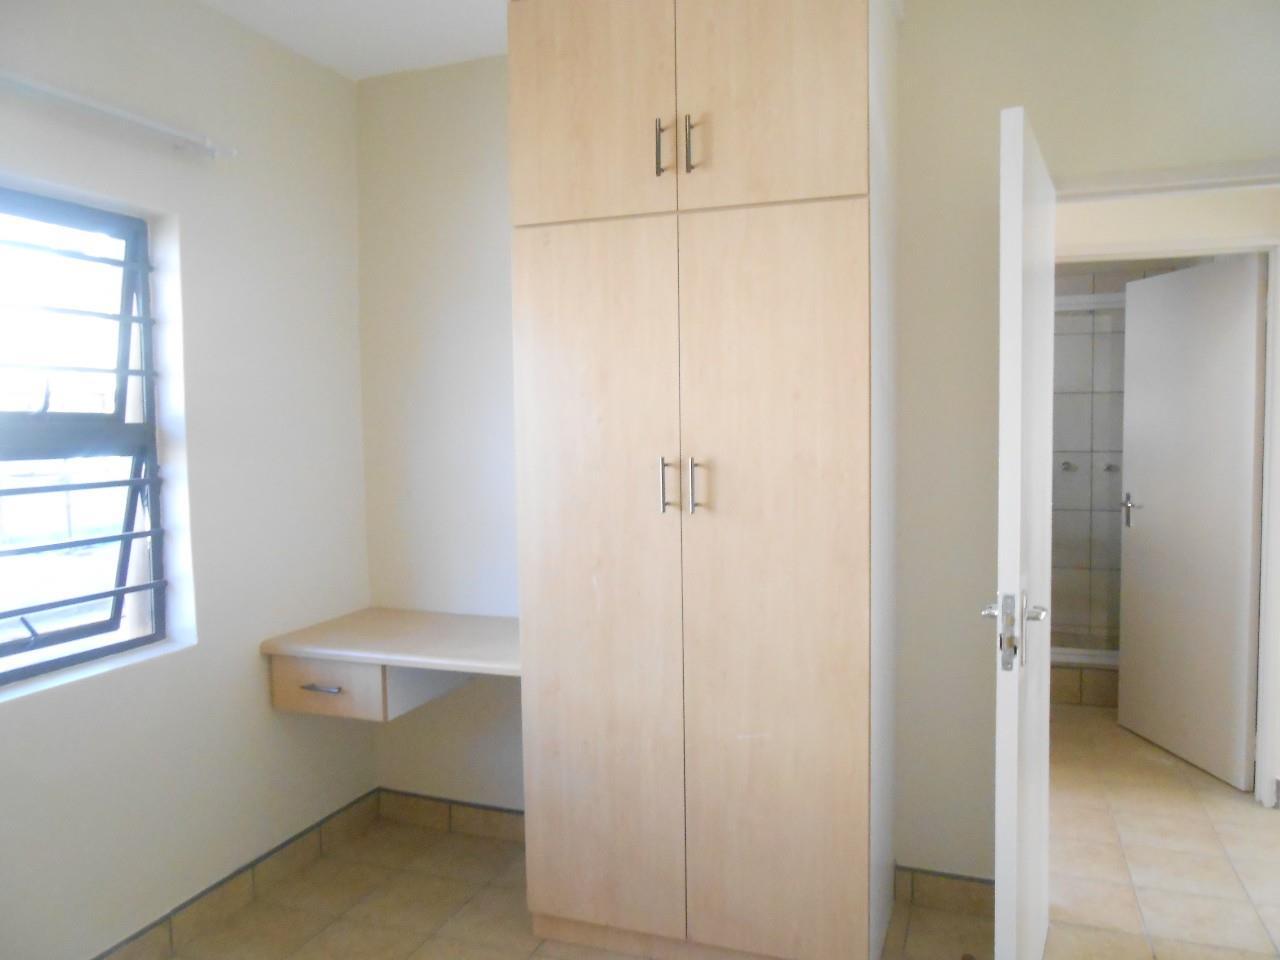 2 Bedroom Apartment / Flat For Sale in Kuruman